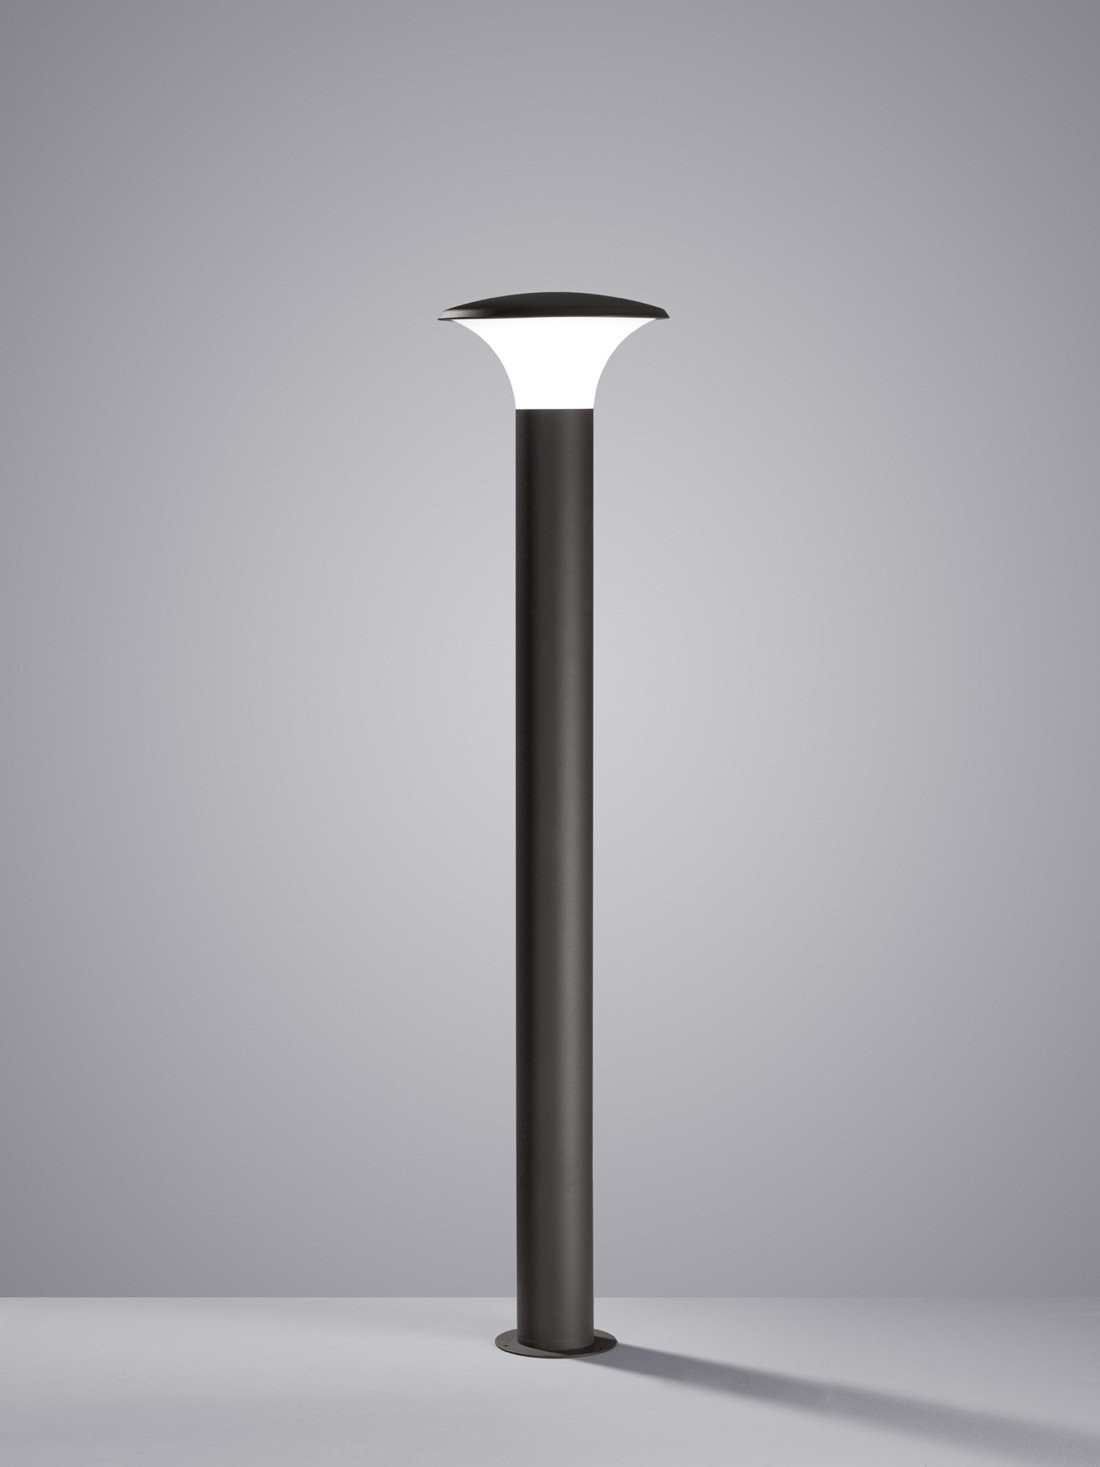 IP44 Anthracite /Ø:26,0cm 4,0 Watt H:120,0cm 3000K TRIO E27 Plastique Kongo incl 1 x LED Corps: Fonte dAluminium Potelets Blanc 320 Lm